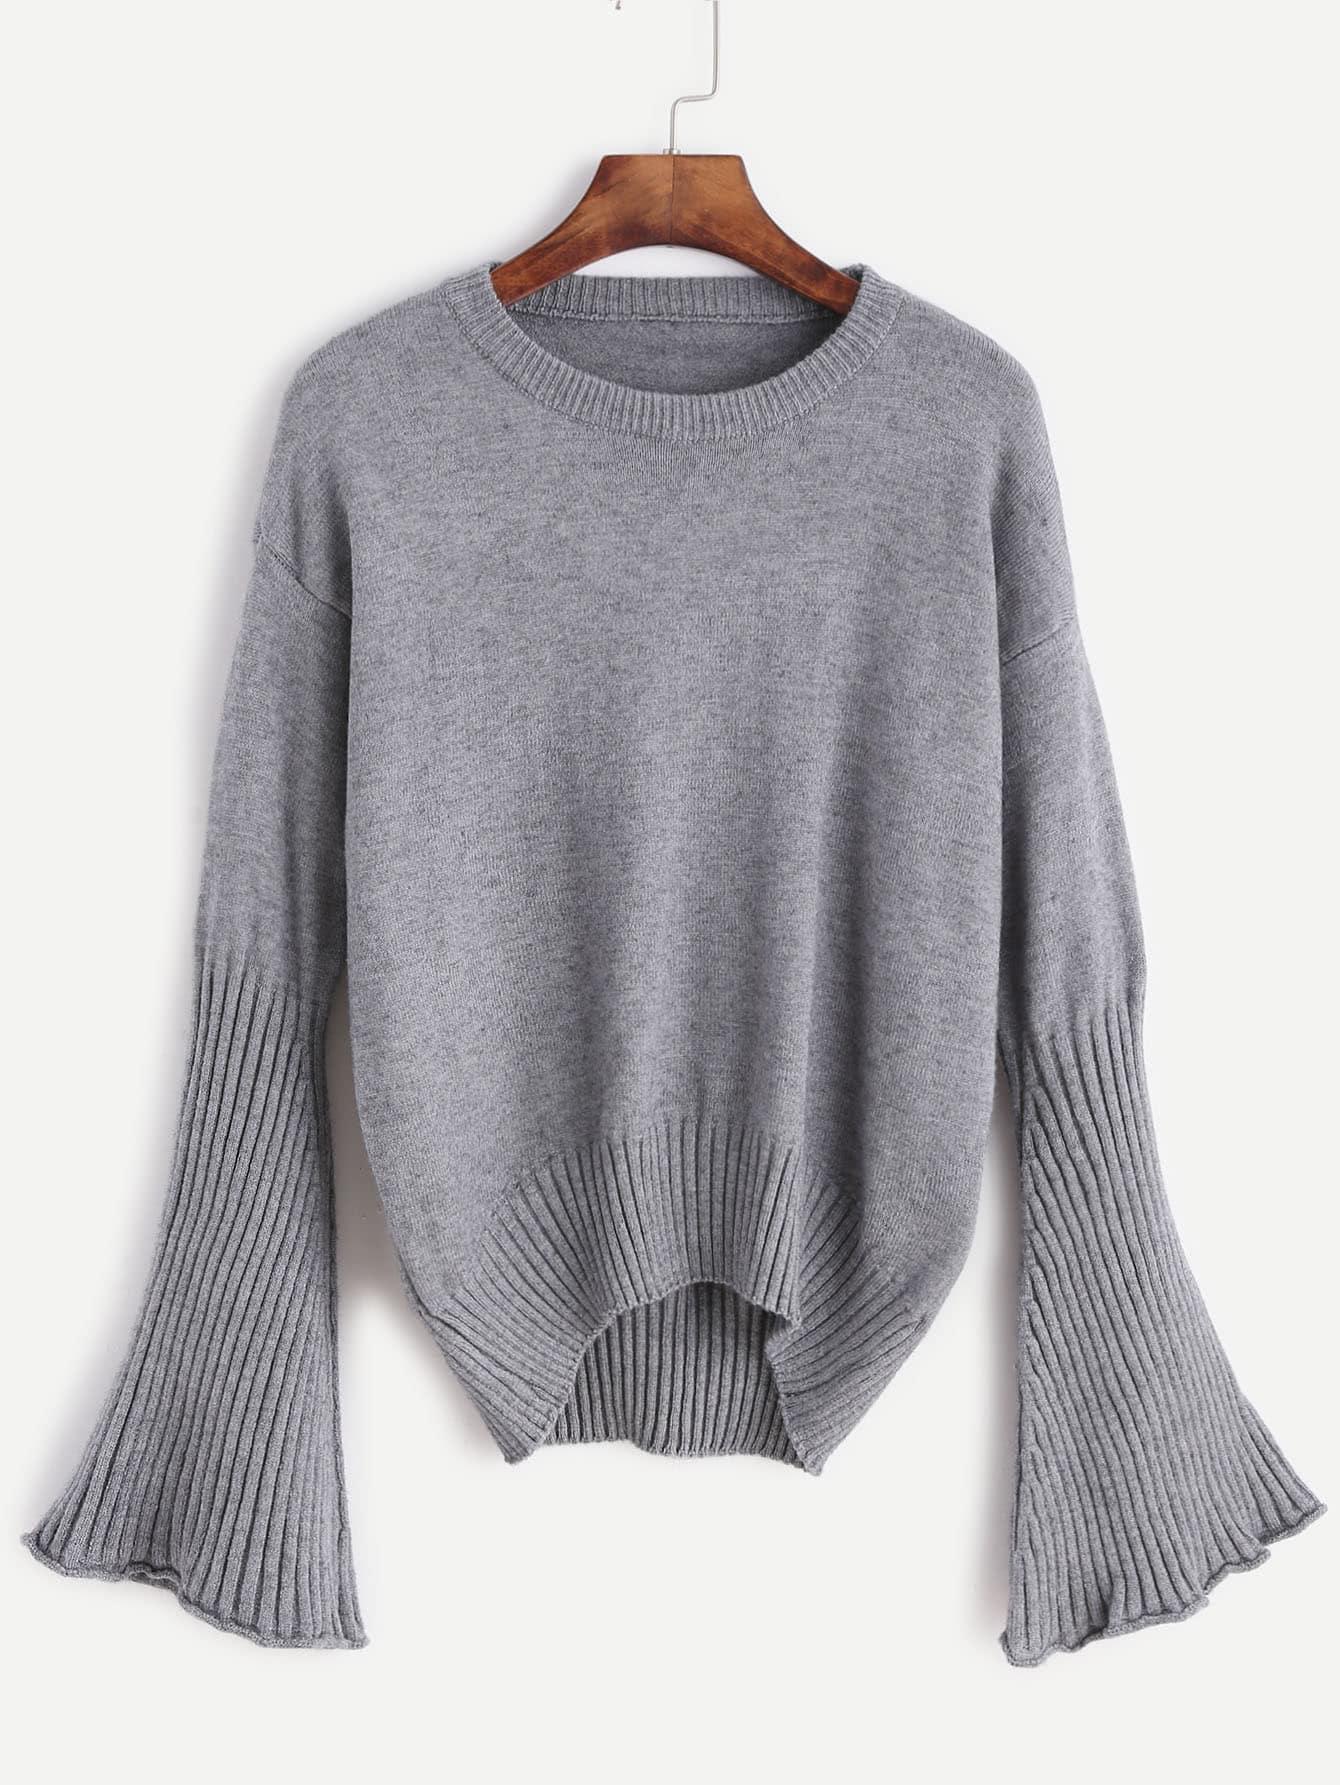 Grey Drop Shoulder Bell Sleeve Dip Hem Sweater sweater161024006